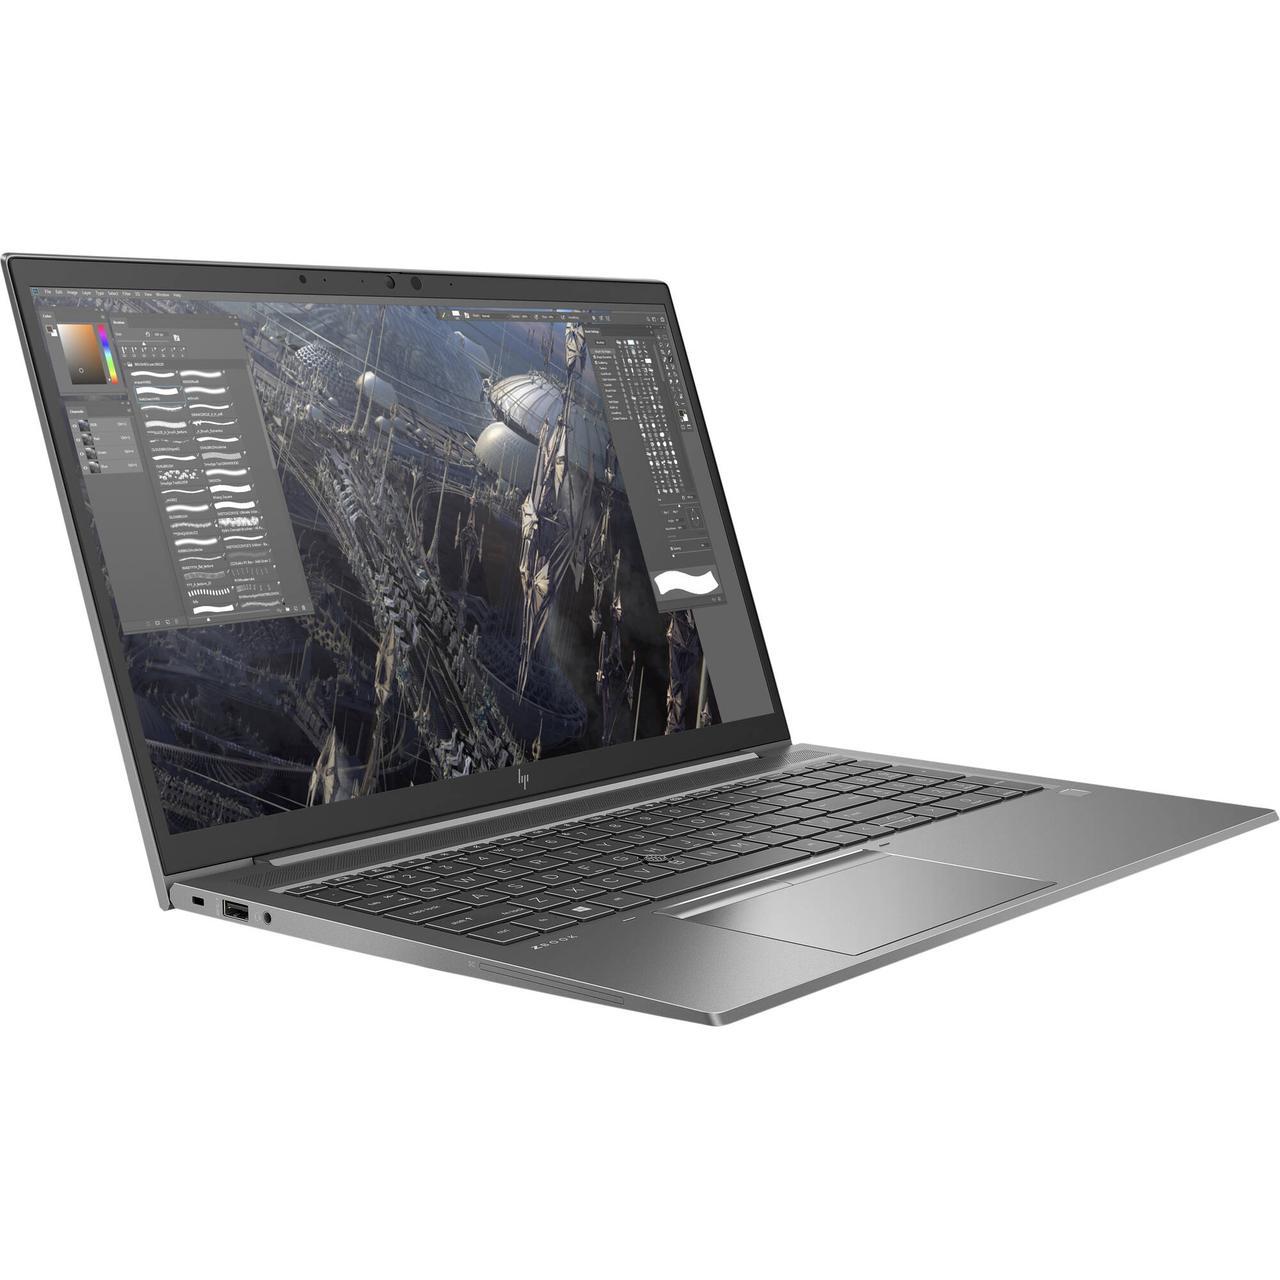 HP ZBook Firefly 15 G8 Workstation (38B09UT#ABA)